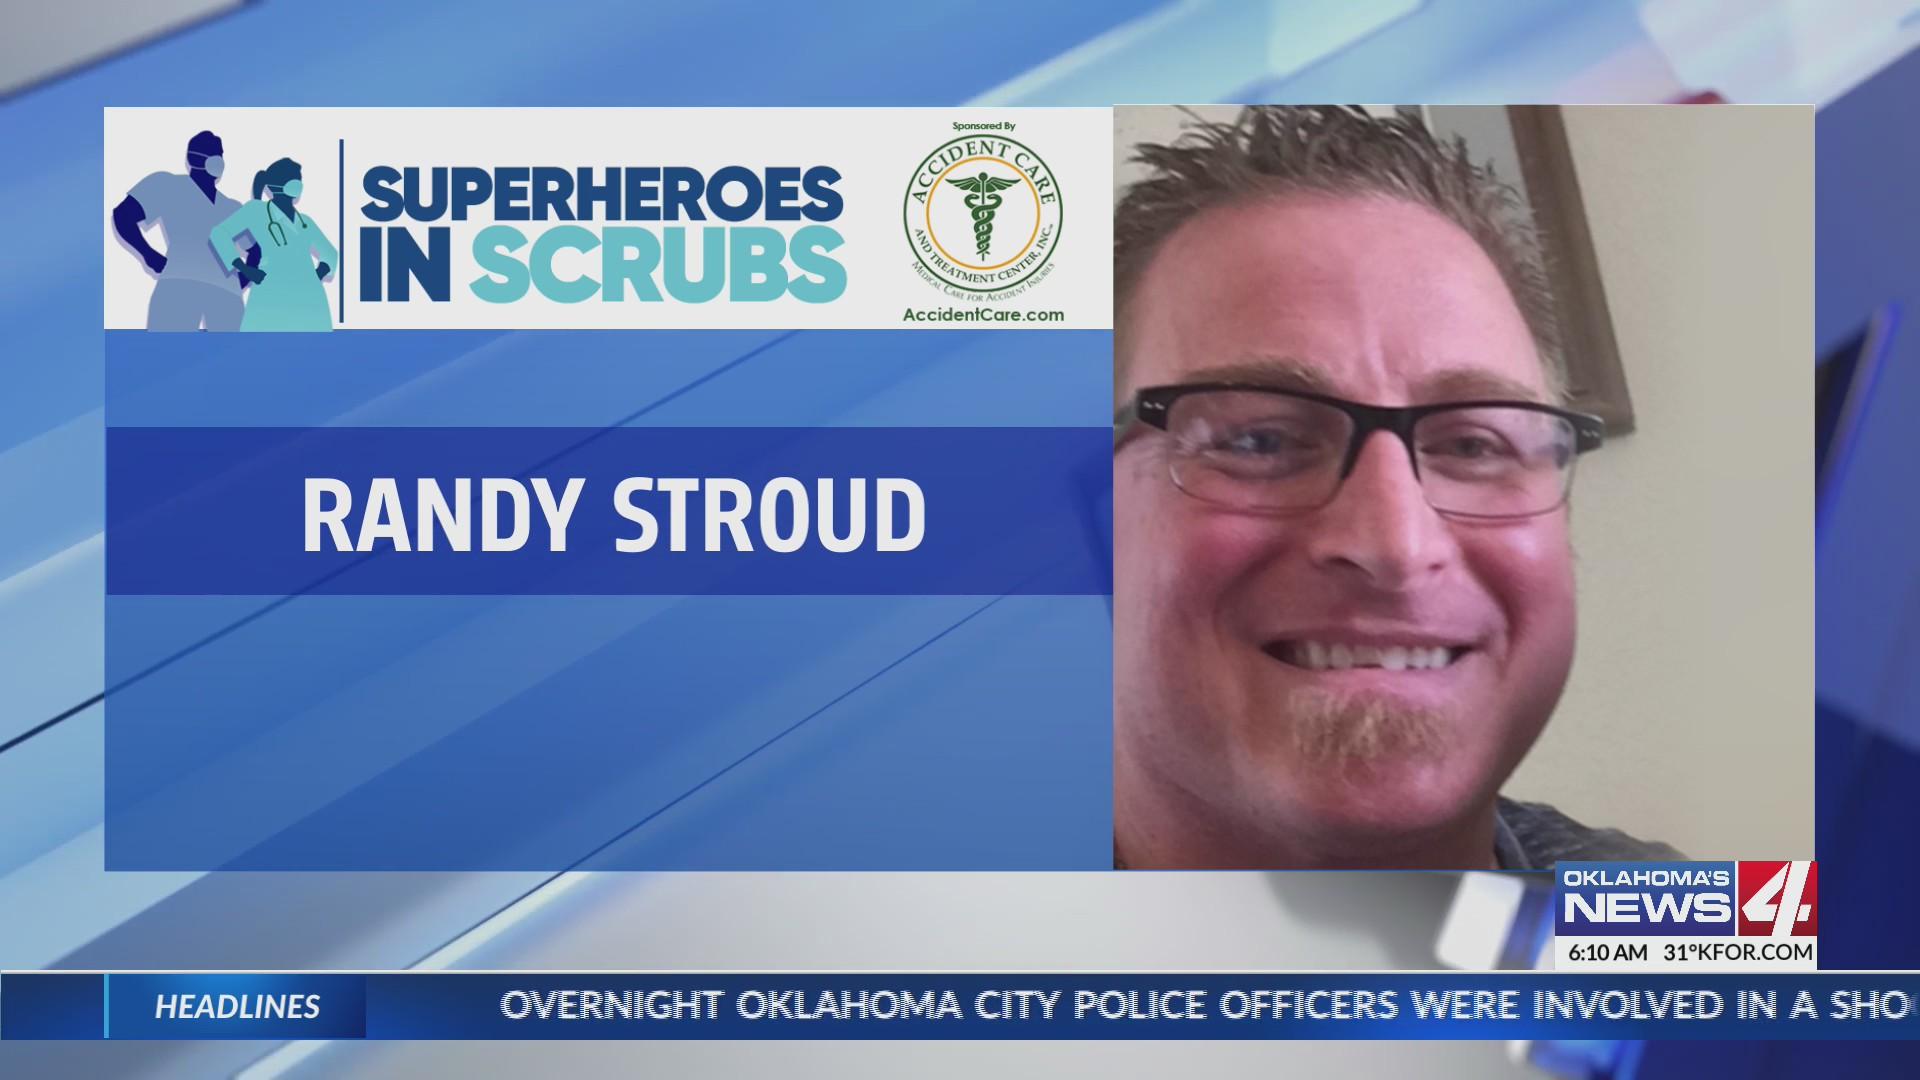 Randy Stroud